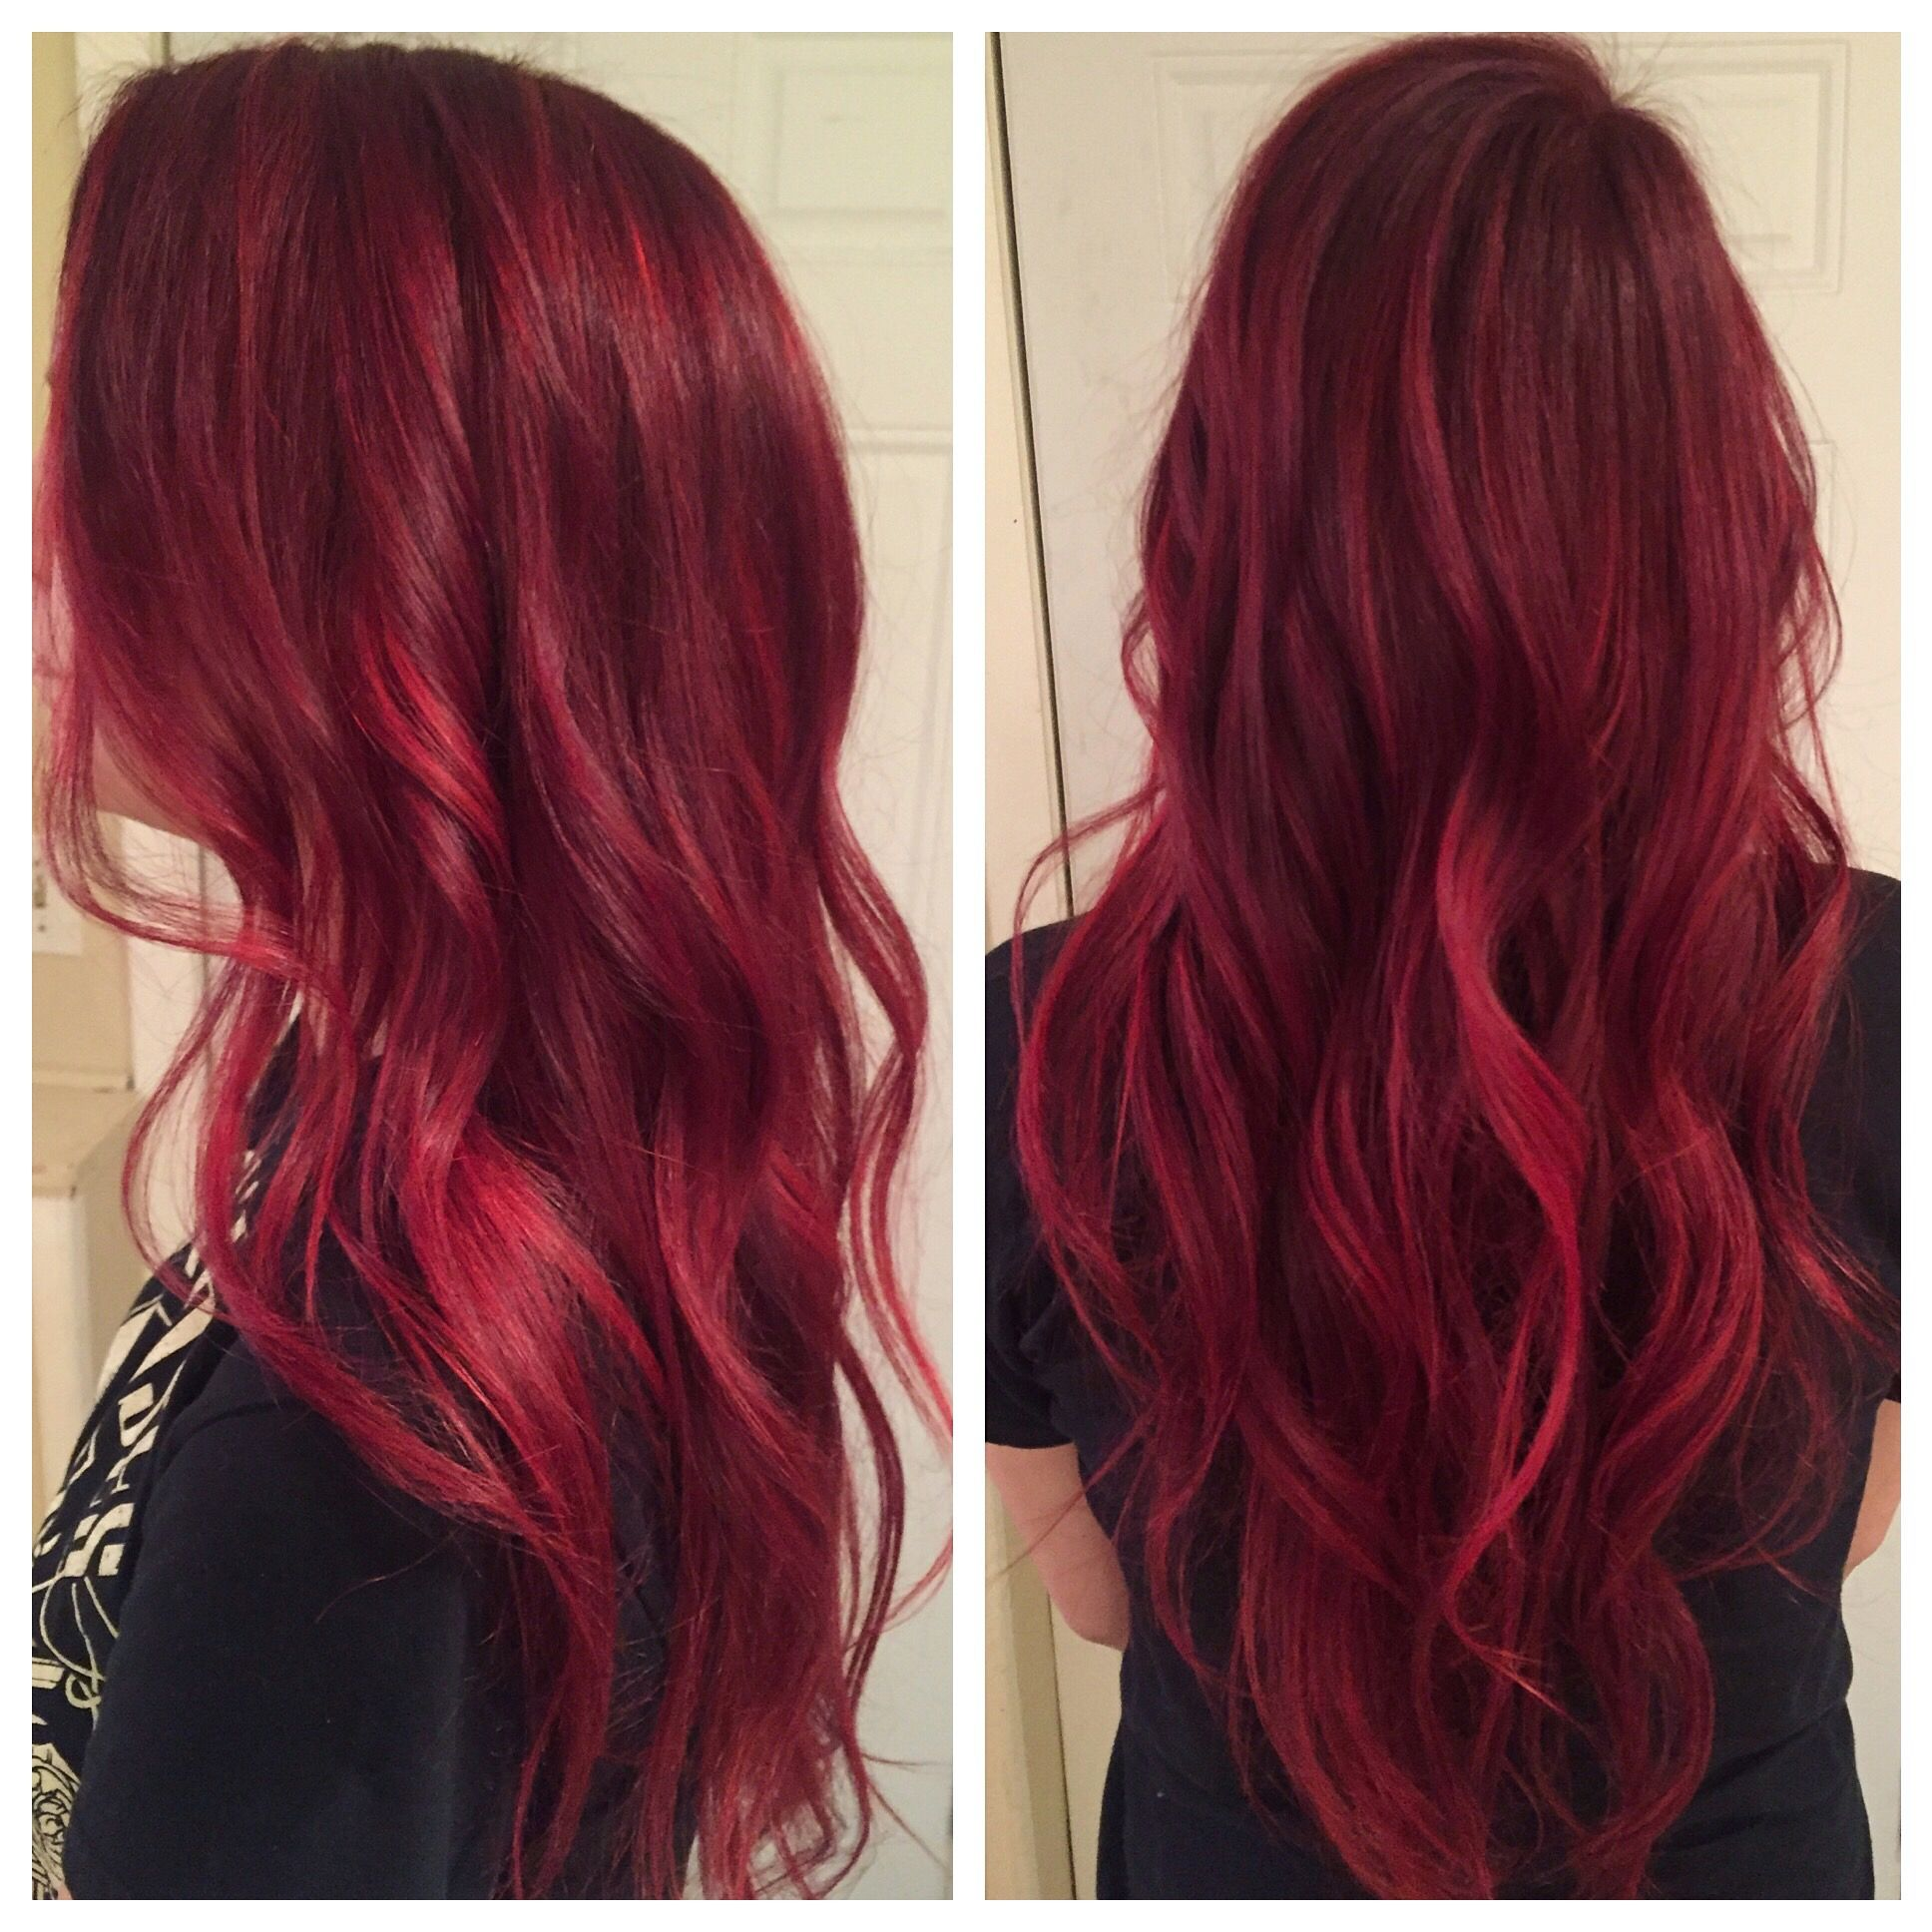 Cabello color rojo magenta